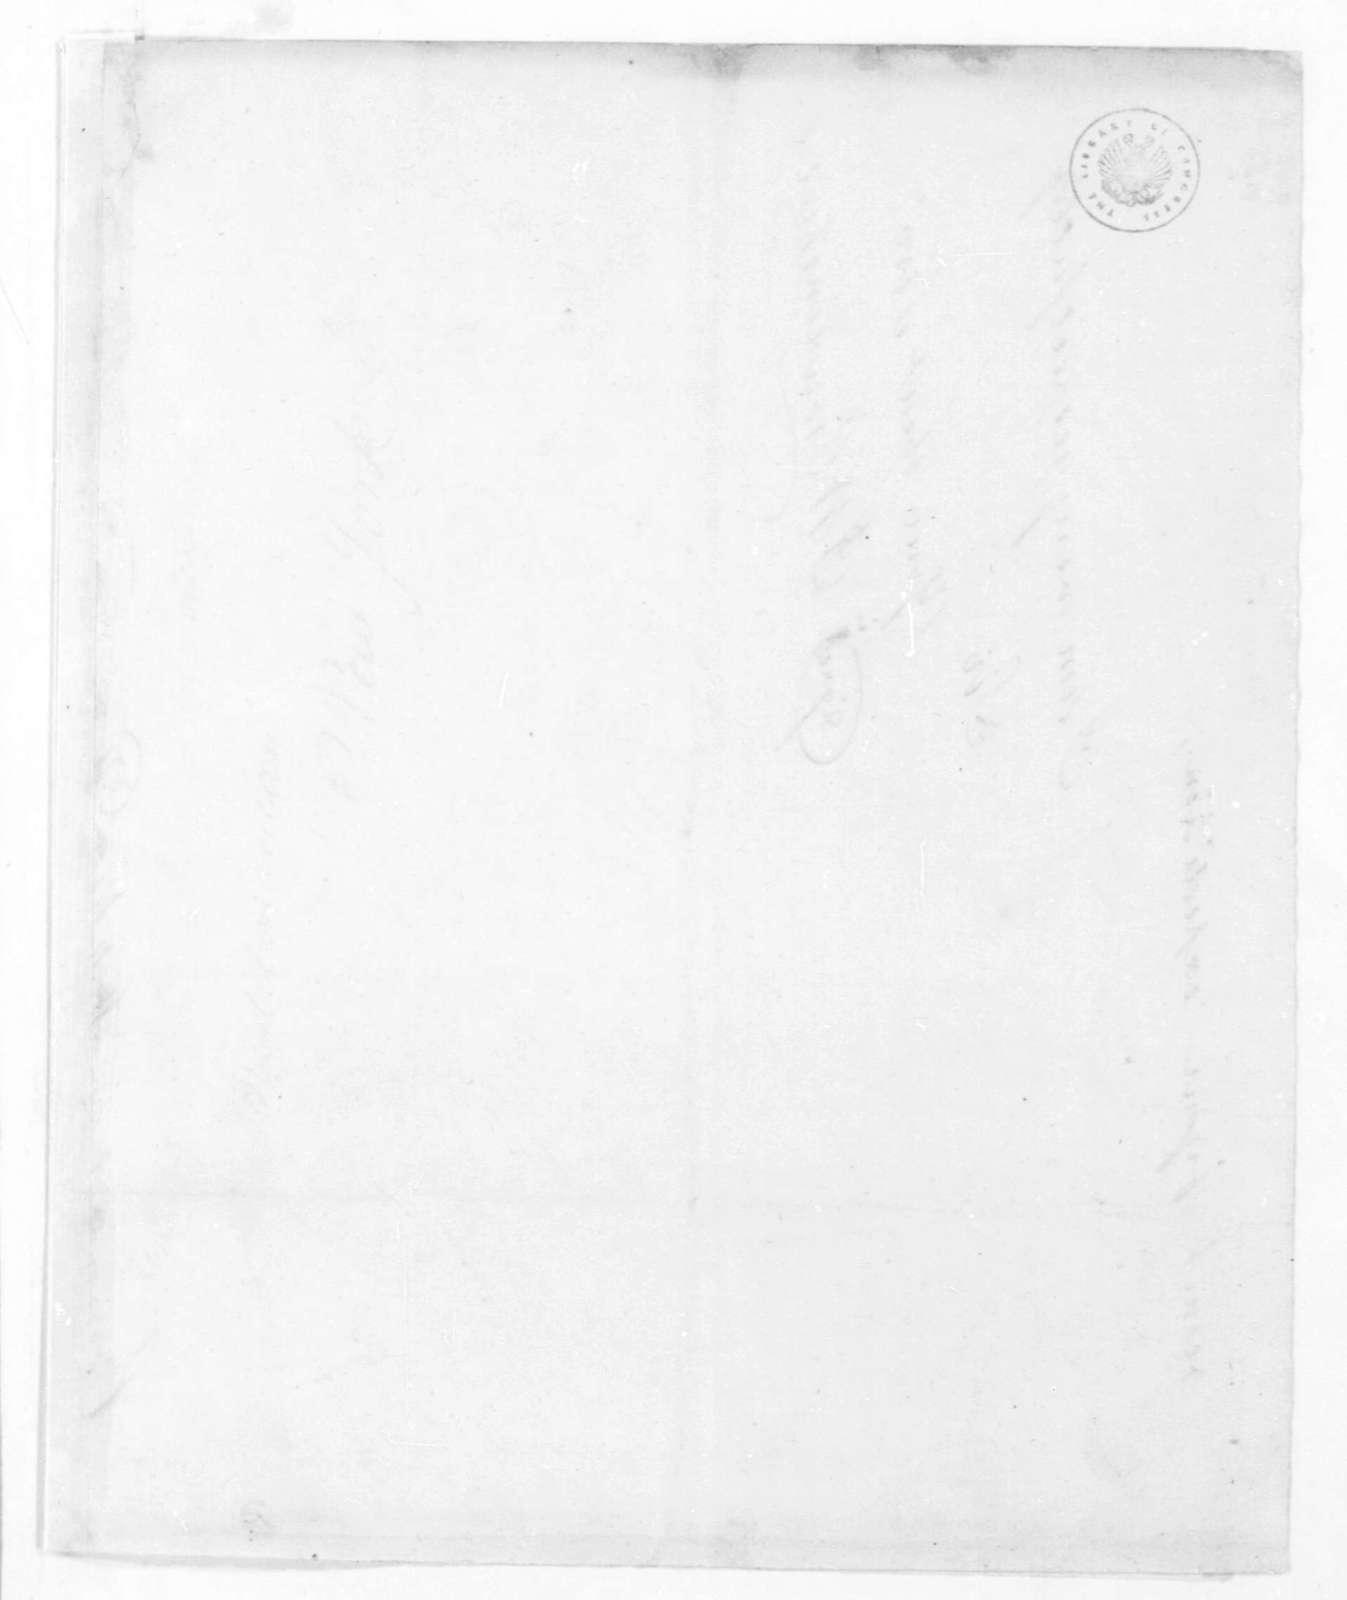 Benjamin W. Crowninshield to Stephen Decatur, April 15, 1815. Military Orders.